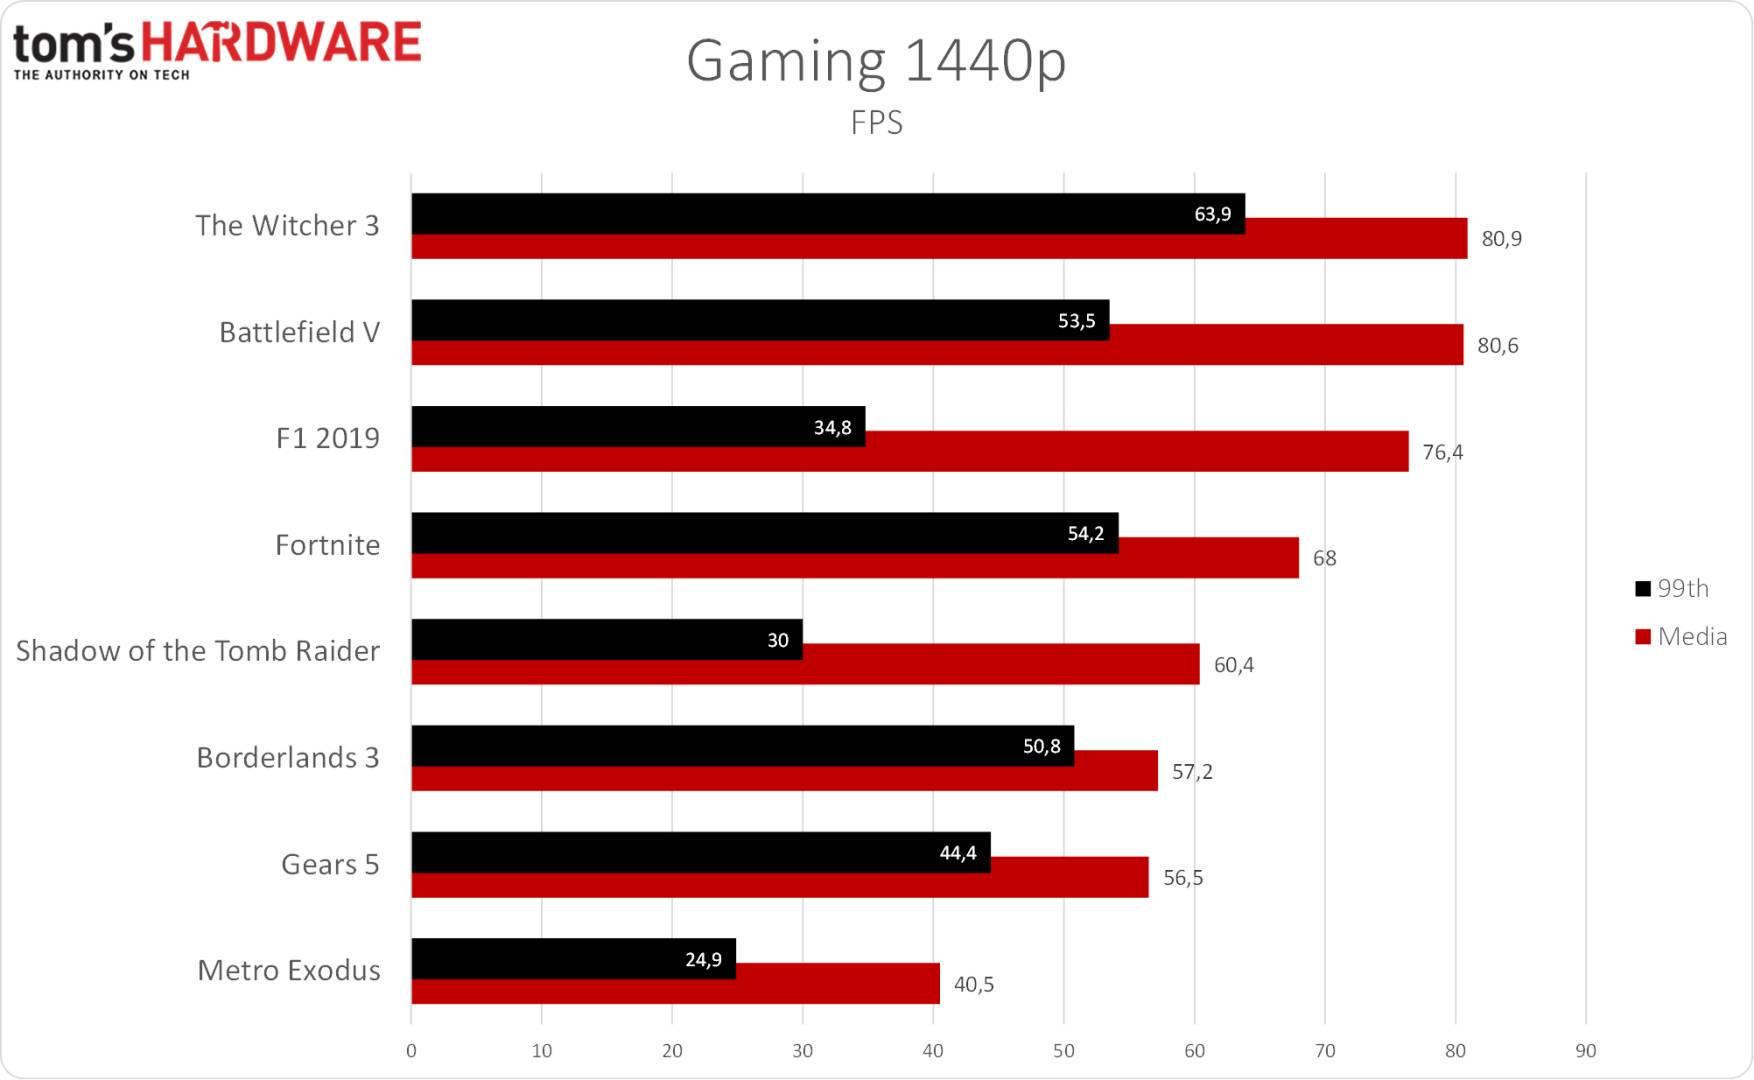 Eurocom Nightsky RX15 - Gaming 1440p